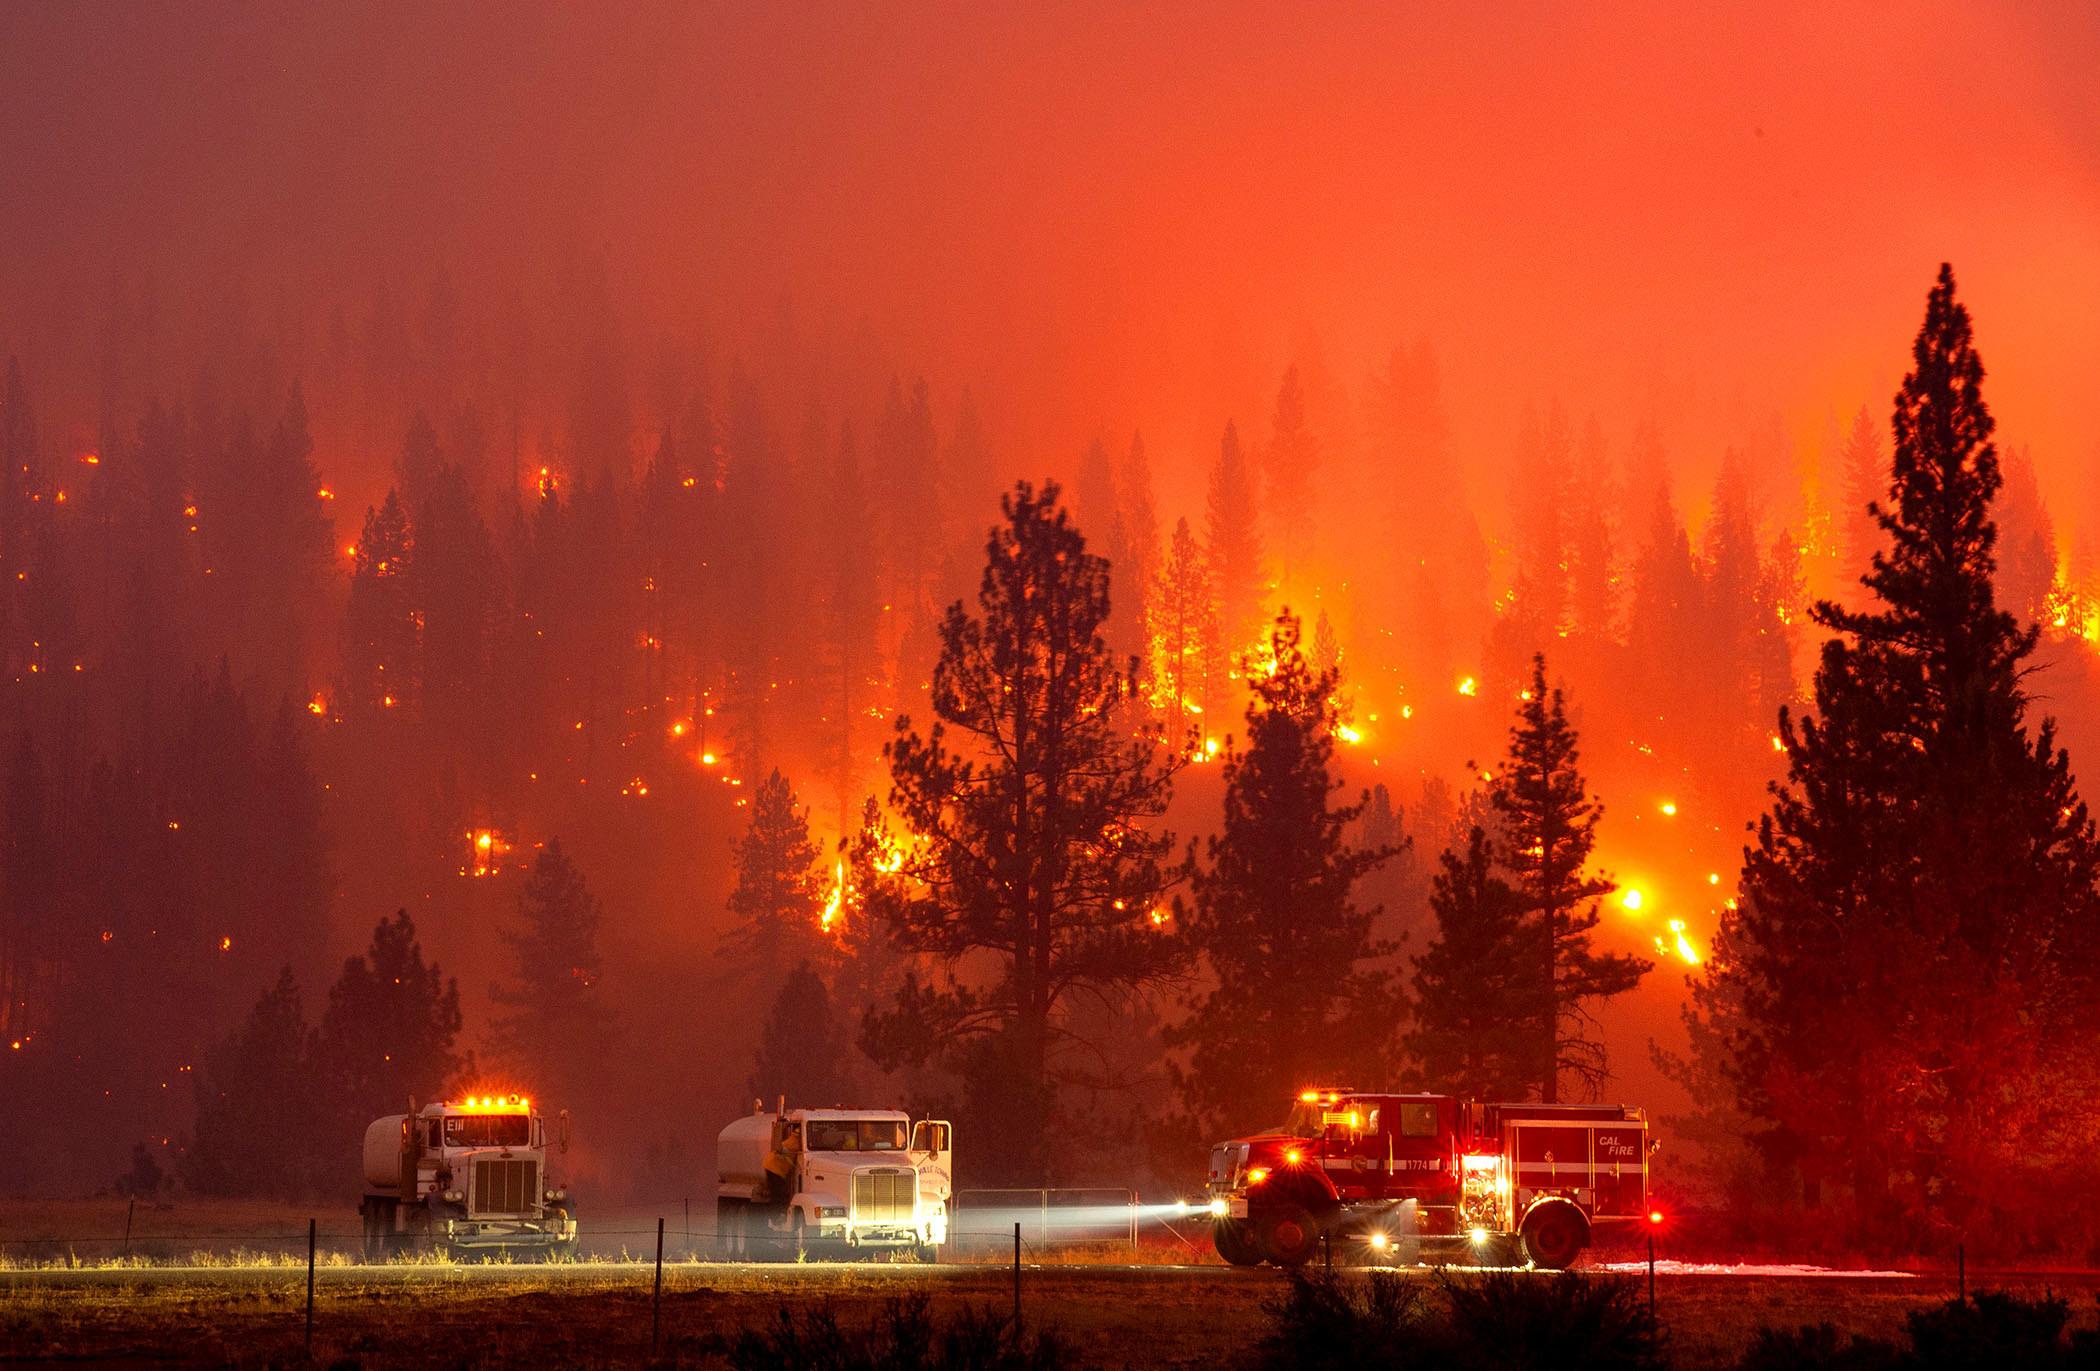 A fire burns through a hillside with trucks parked in a field below